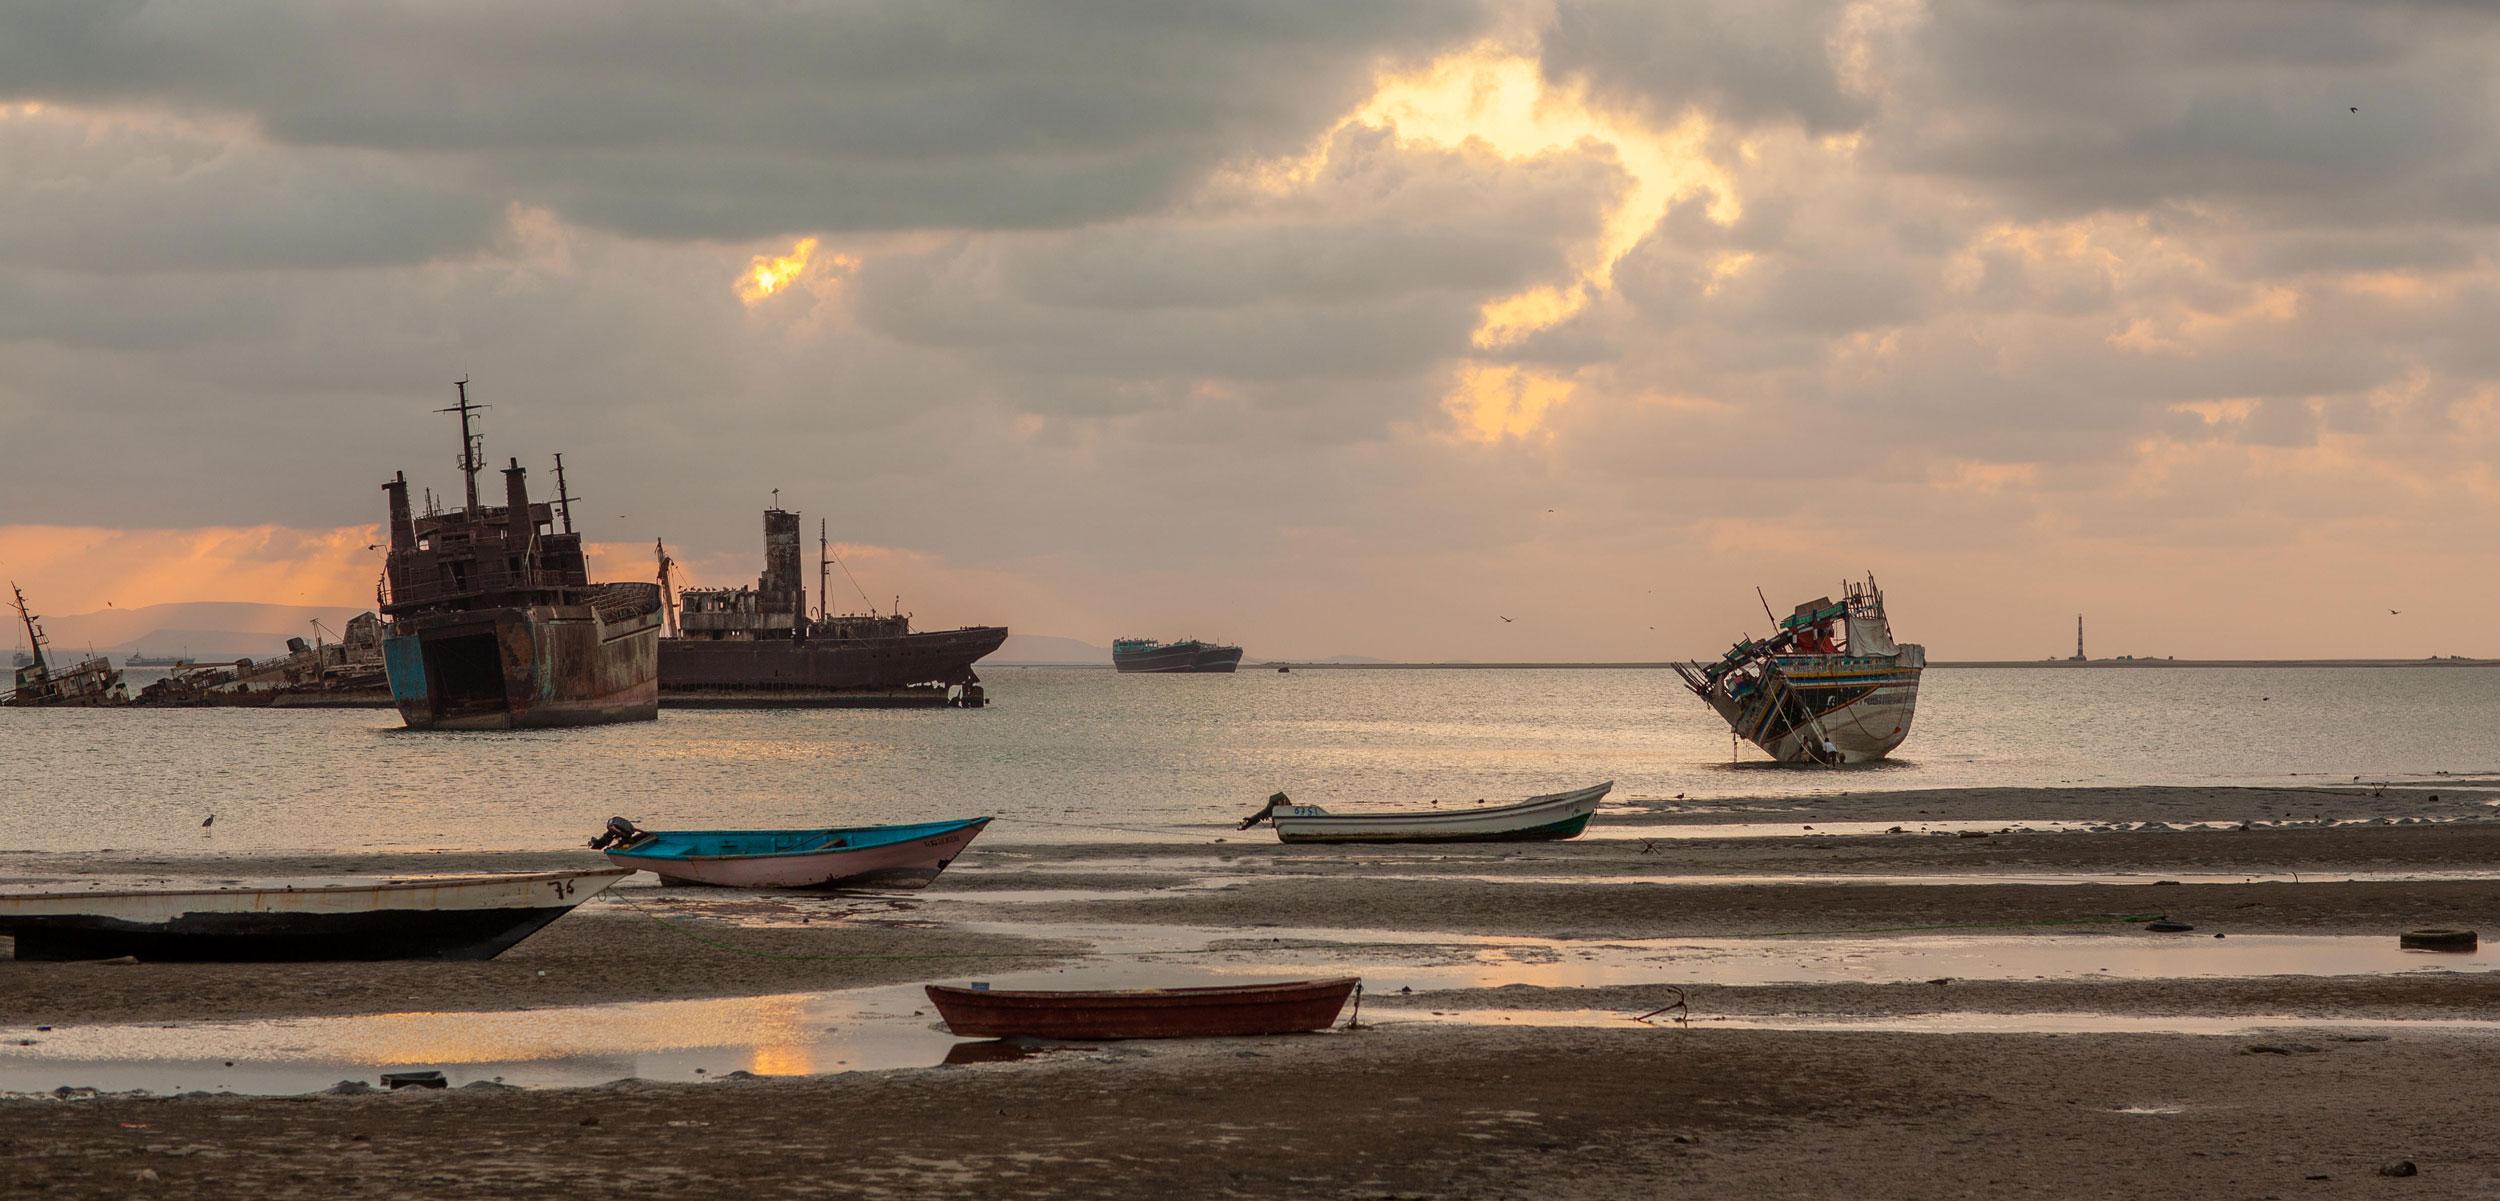 Boats on the beach at sunset, North-Western province, Berbera, Somalia